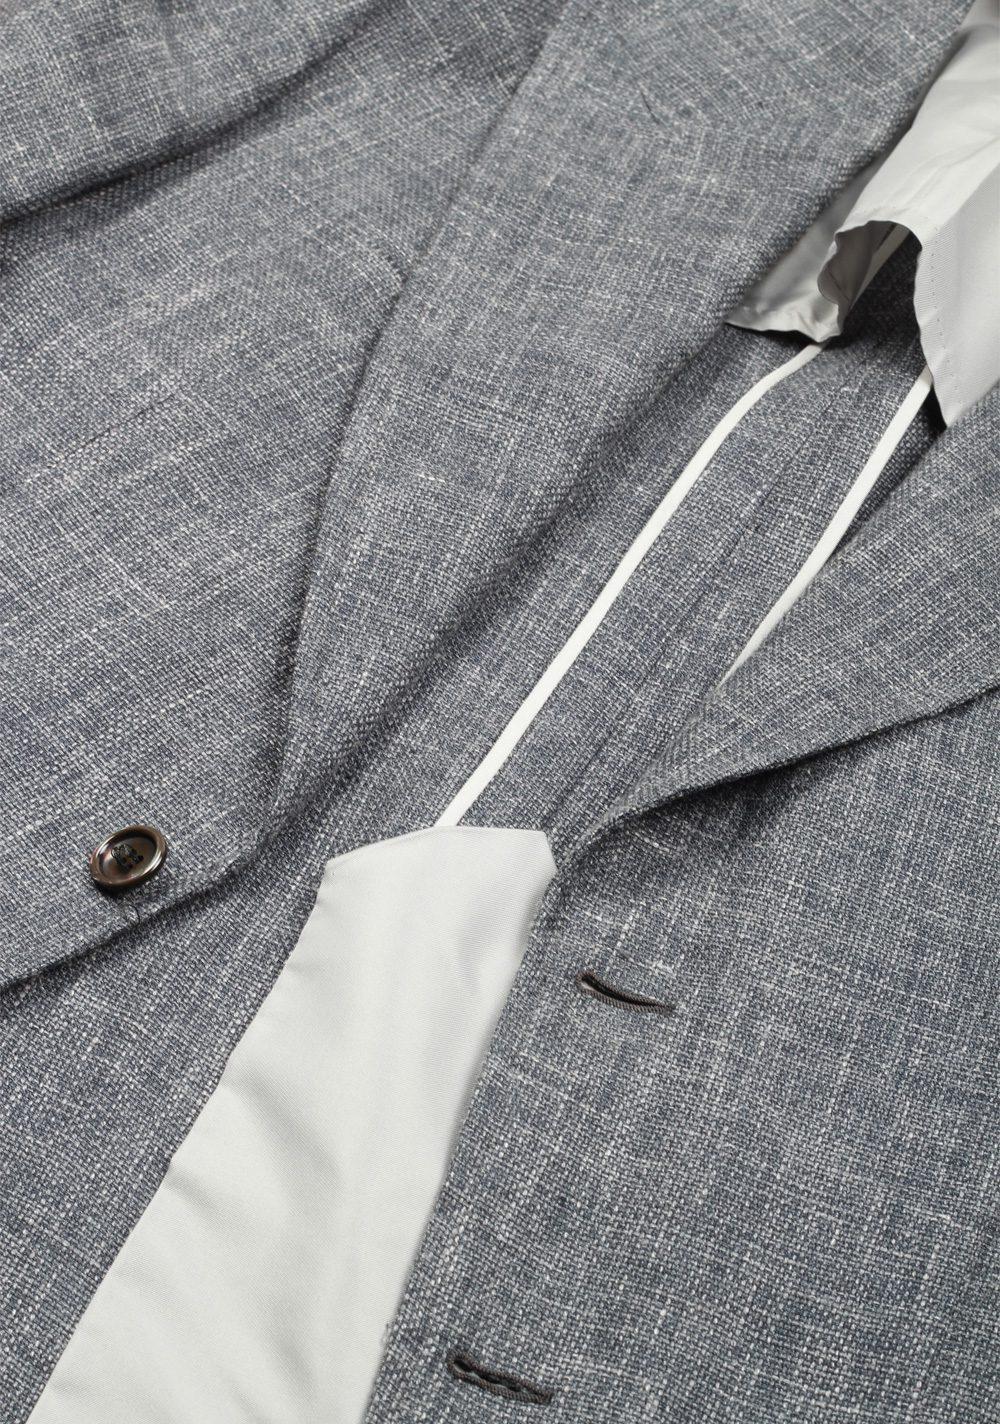 TOM FORD Shelton Gray Sport Coat Size 46 / 36R | Costume Limité